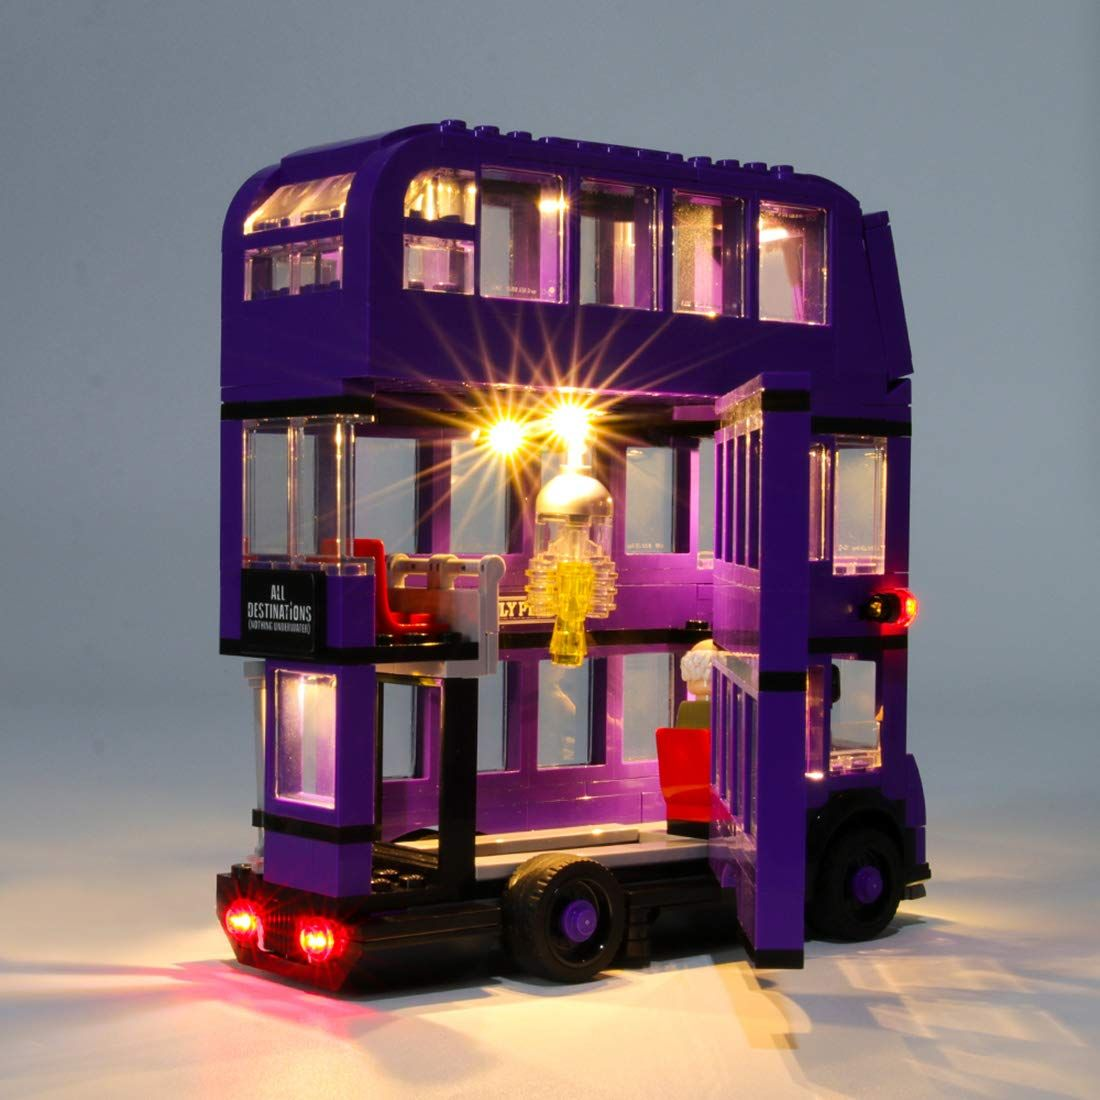 Poxl Led Beleuchtungsset Licht Set Fur Lego Harry Potter Knight Bus Led Kabel Licht Kit Fur Lego 75957 Ohne Lego Set In 2020 Lego Sets Lego Harry Potter Led